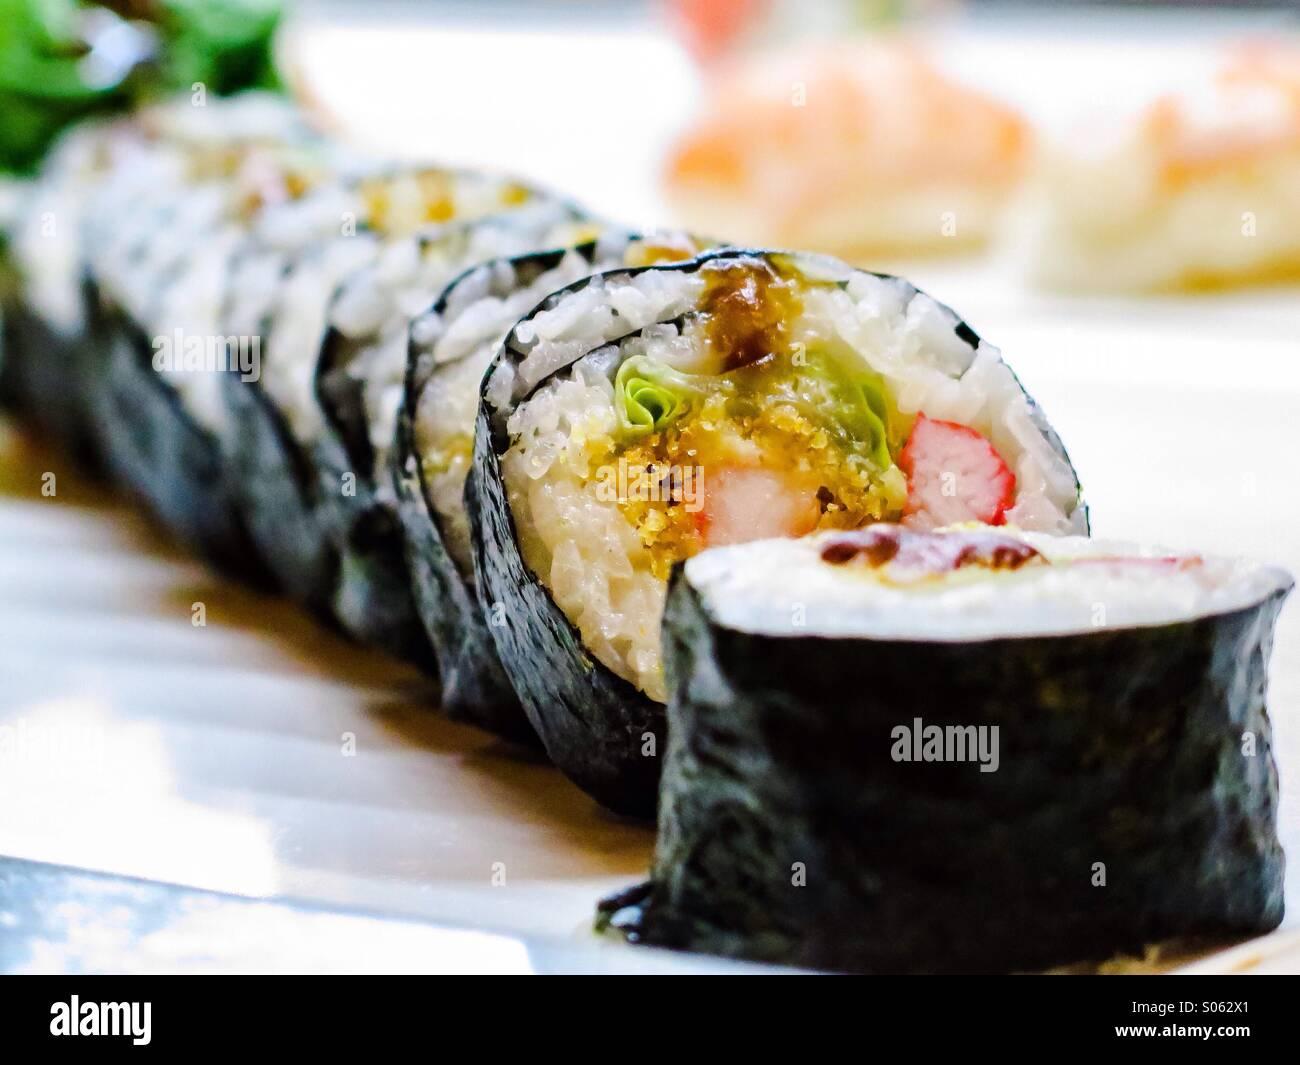 California sushi roll Photo Stock